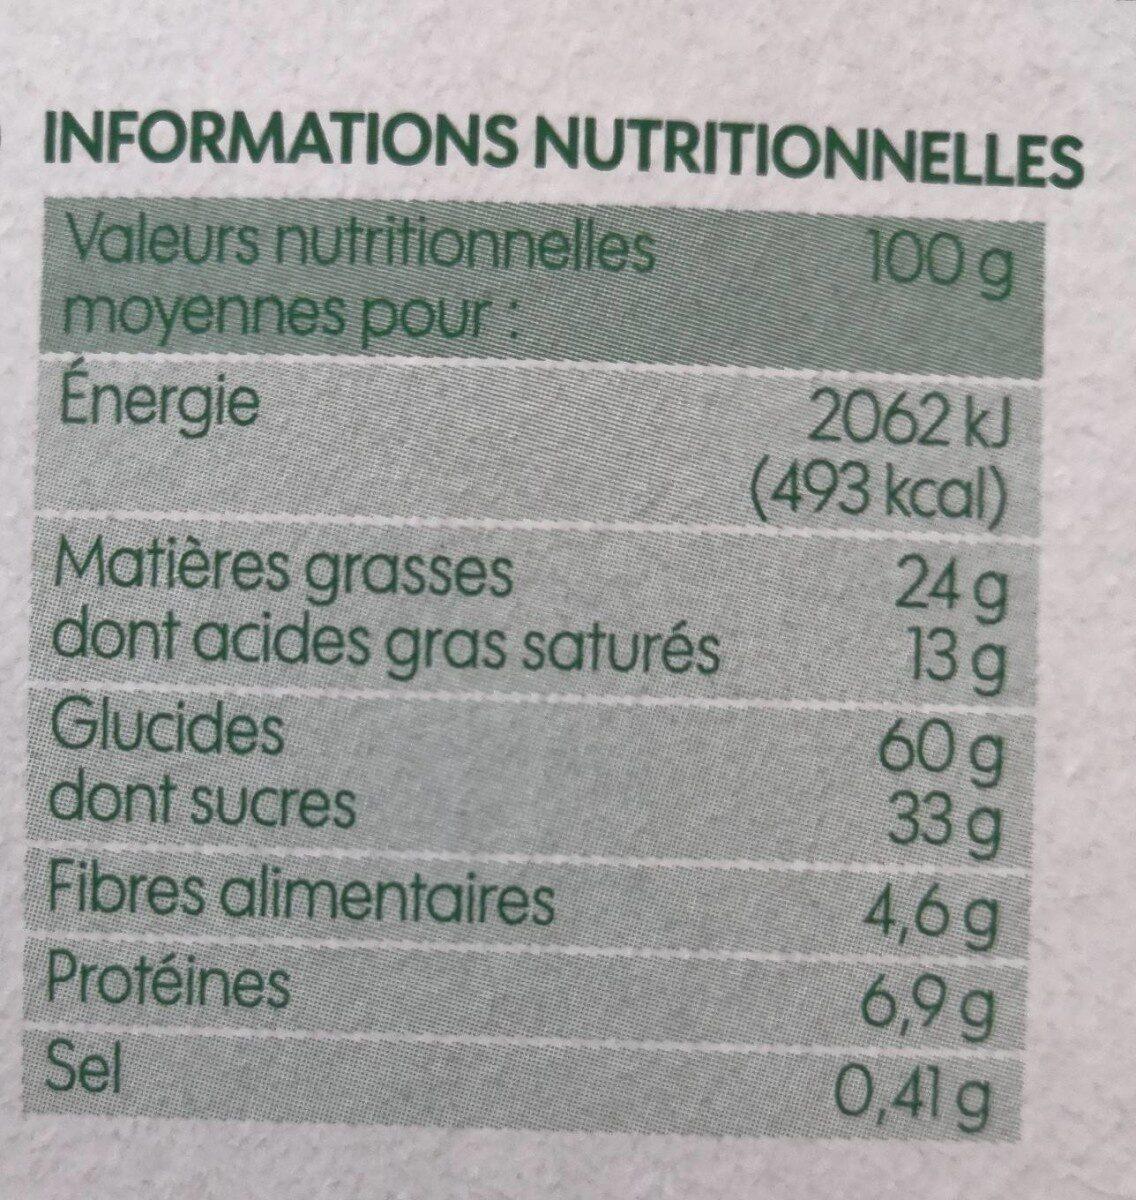 Cookies parfum tout chocolat bio - Voedingswaarden - fr